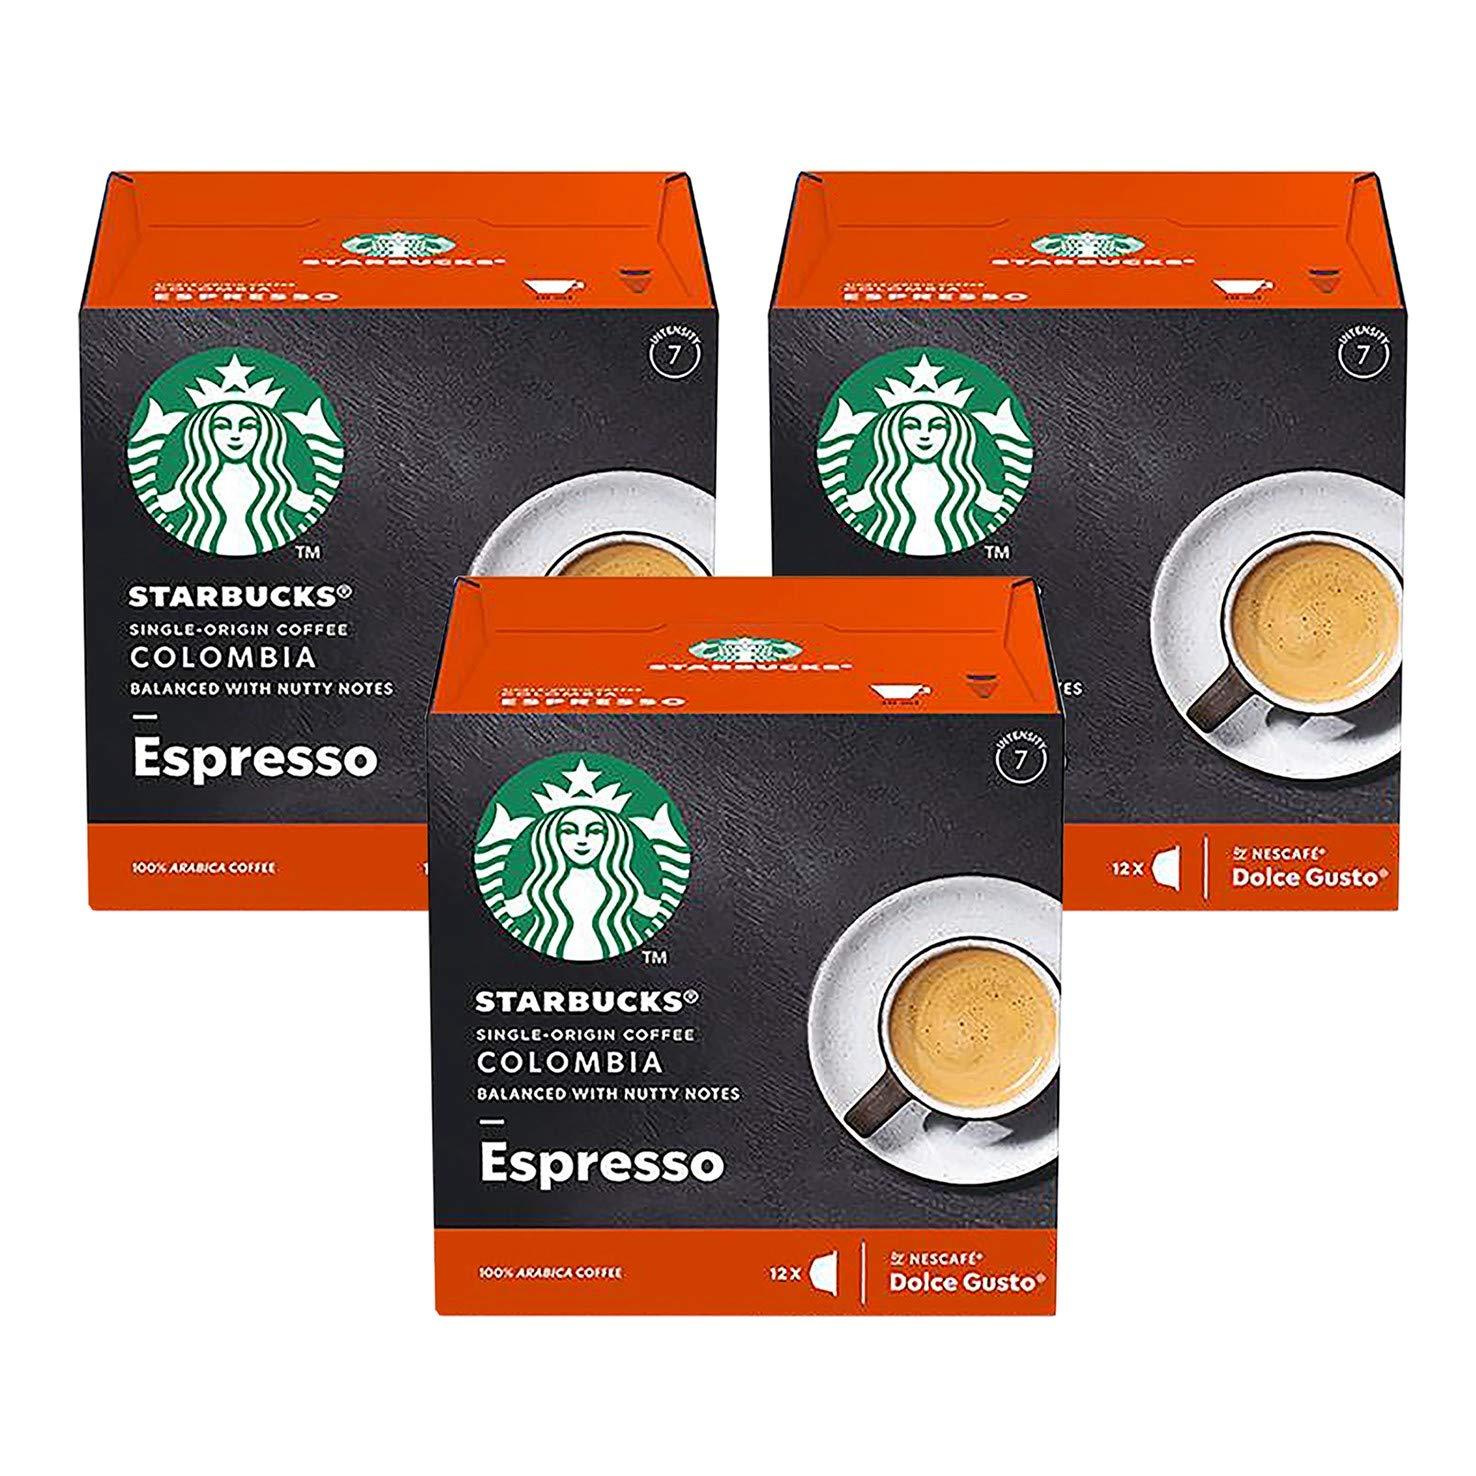 Nescafe Dolce Gusto Starbucks Colombia Espresso x 3 Boxes (36 Capsules) 36 Drinks